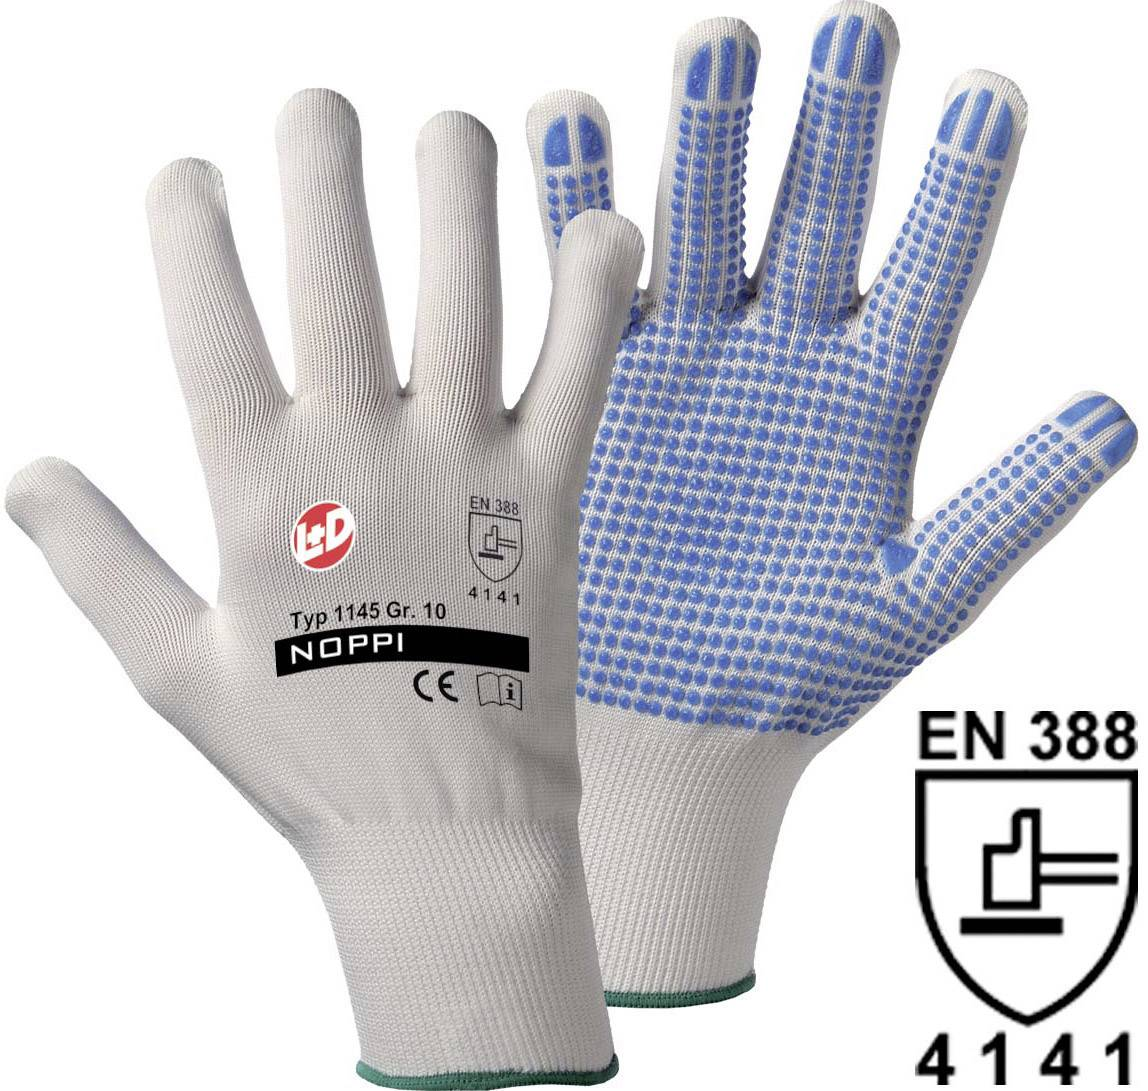 Pracovné rukavice Leipold + Döhle NOPPI 1145, velikost rukavic: 7, S